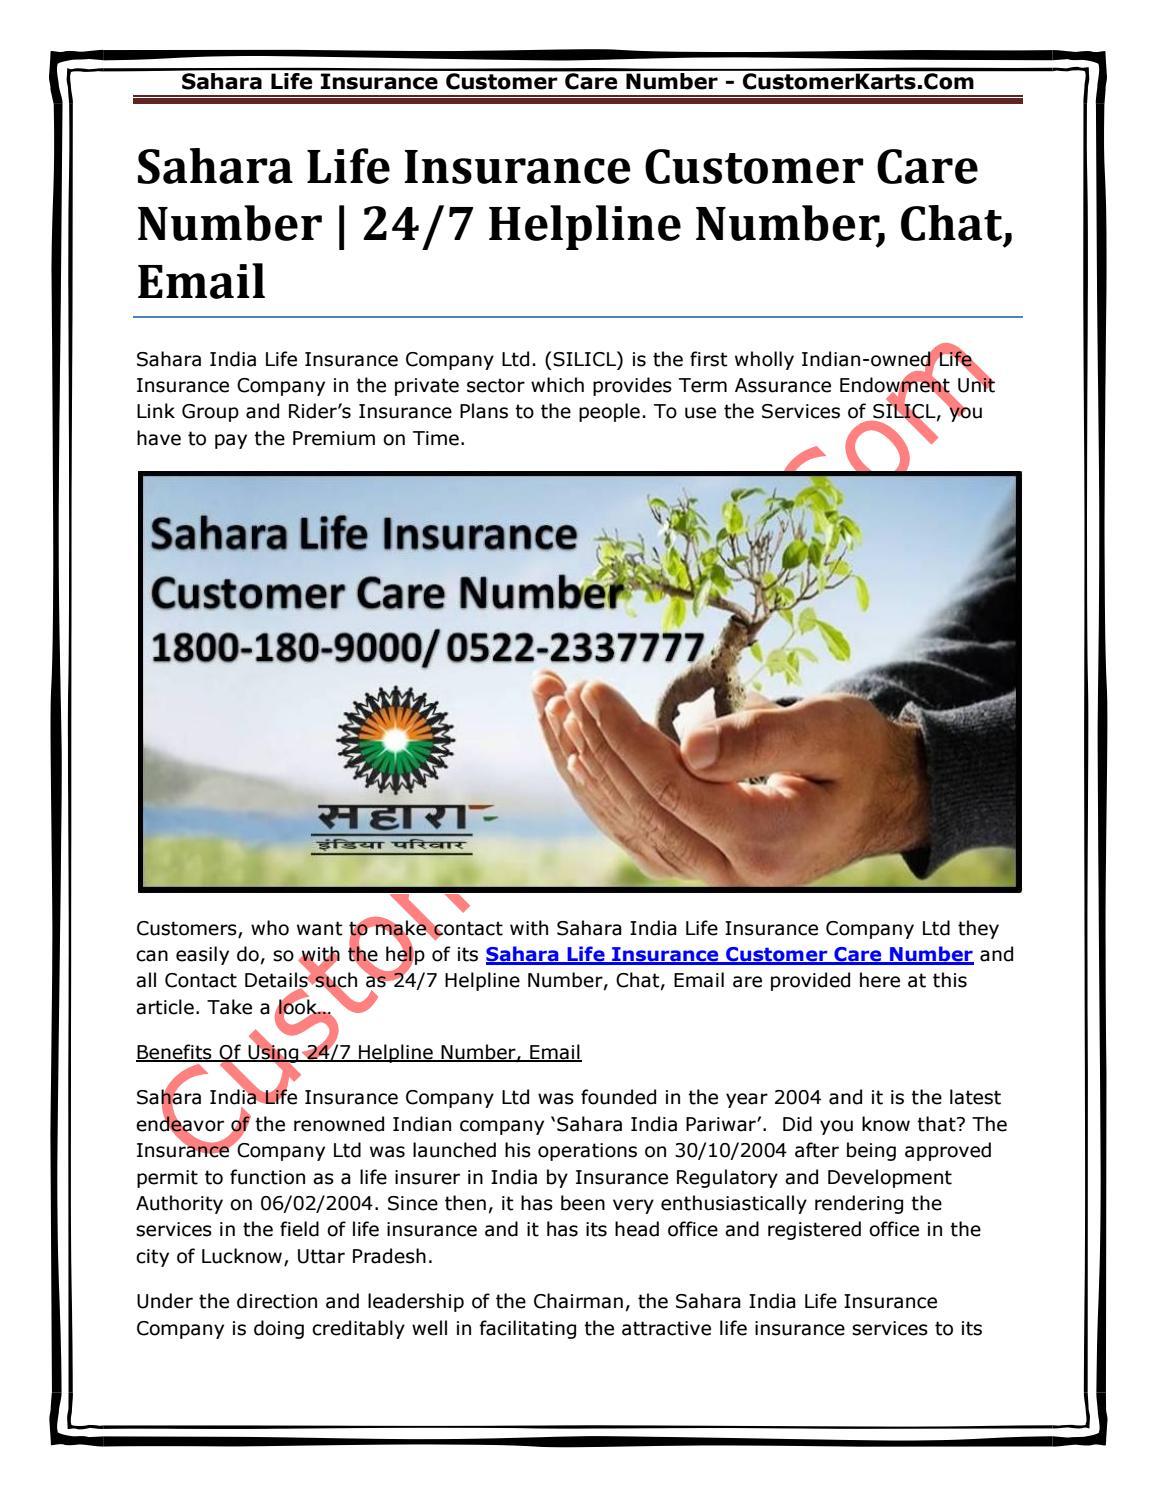 Sahara life insurance customer care number by Customer Karts